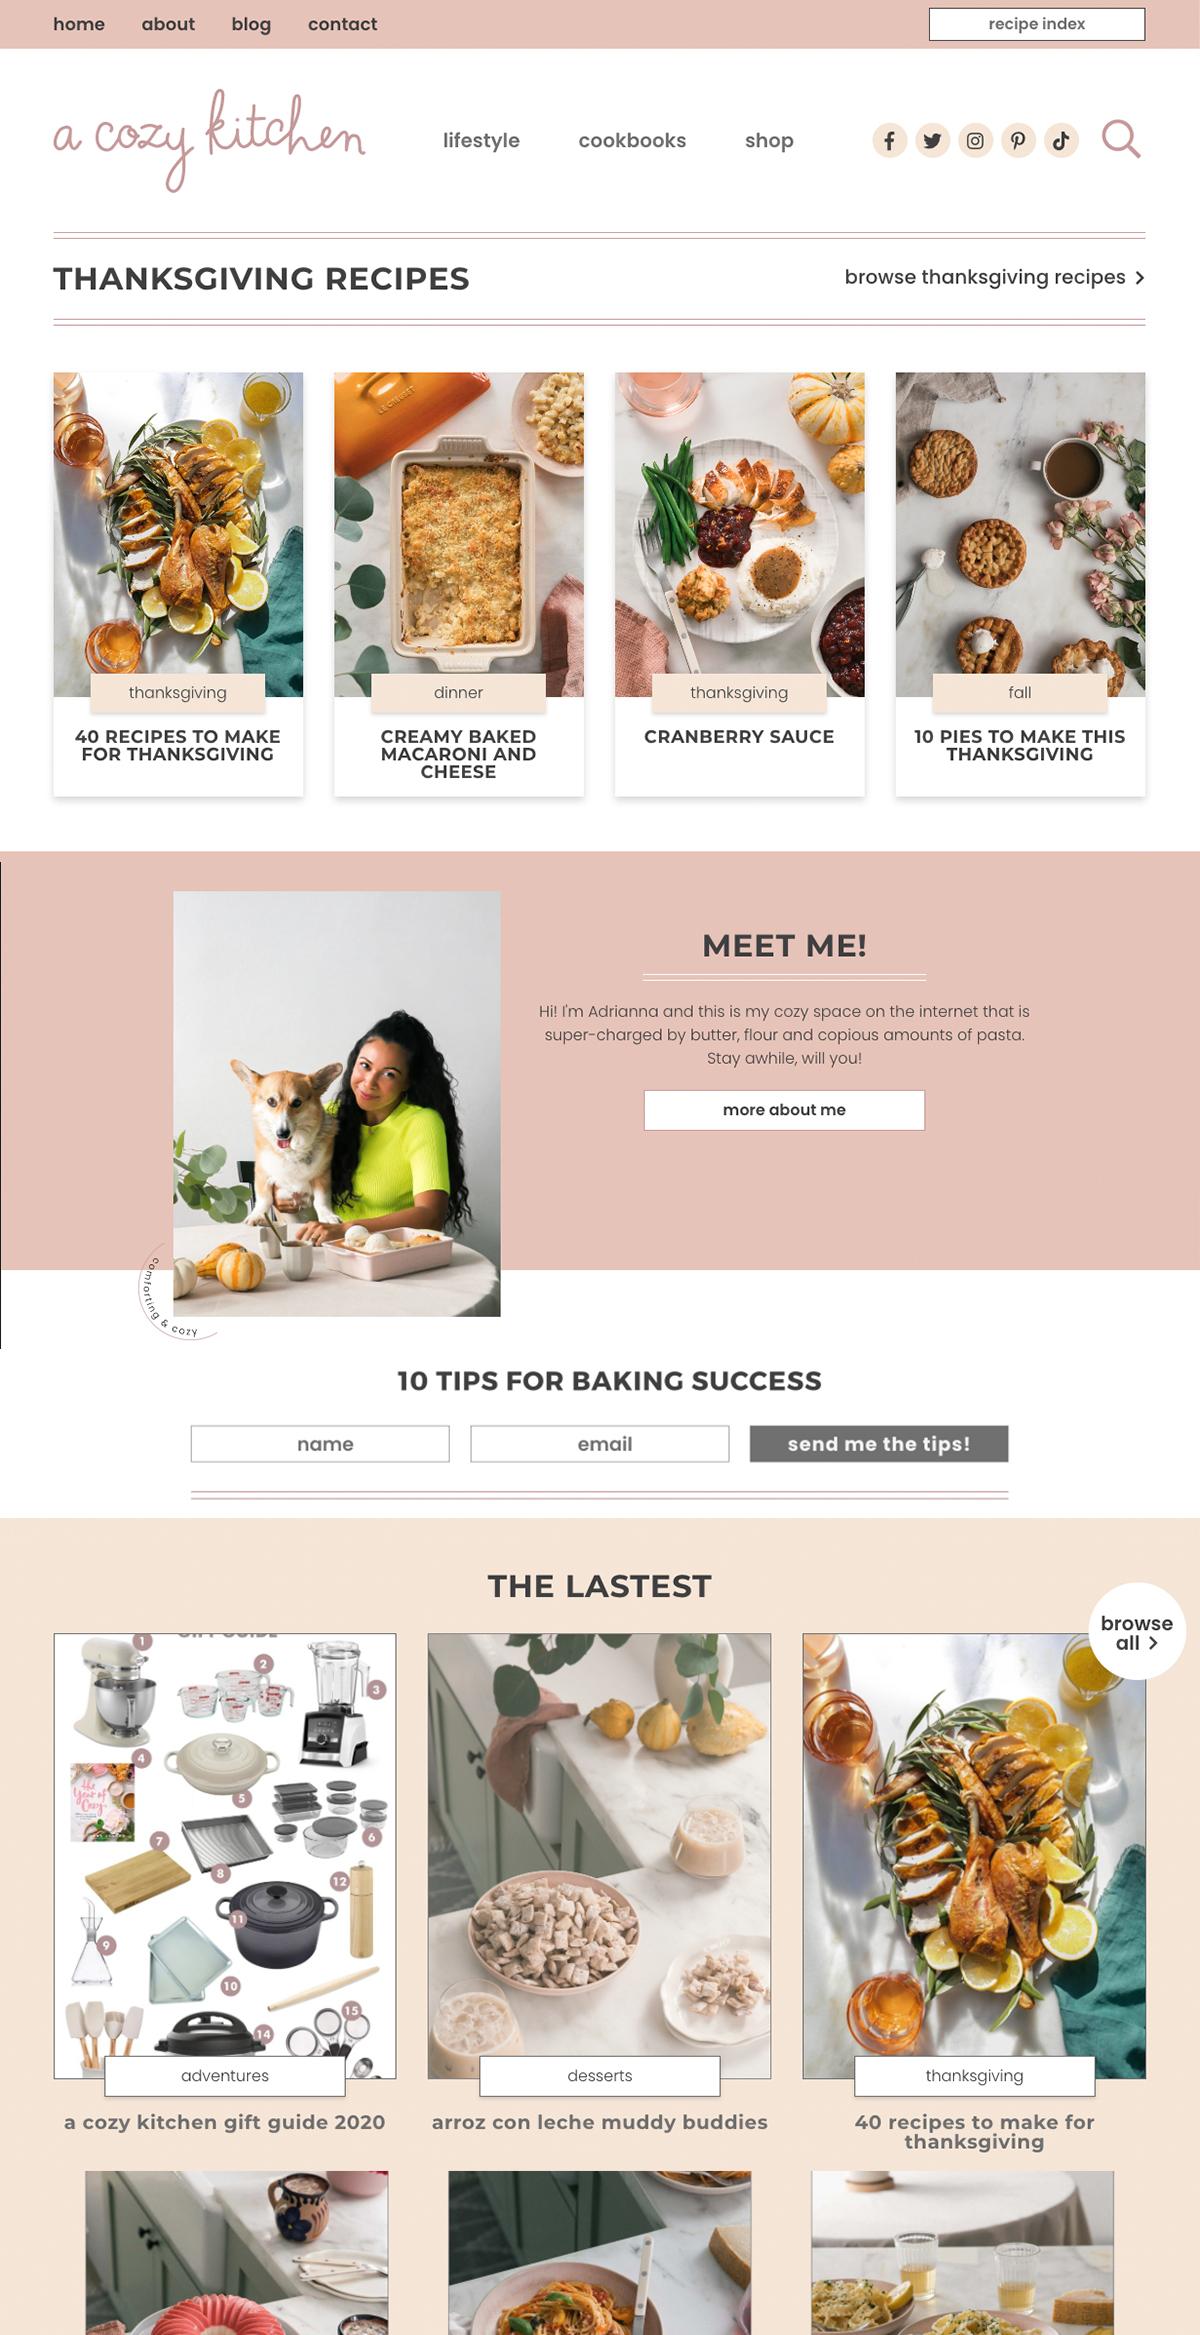 a-cozy-kitchen-web-design-food-blog-full